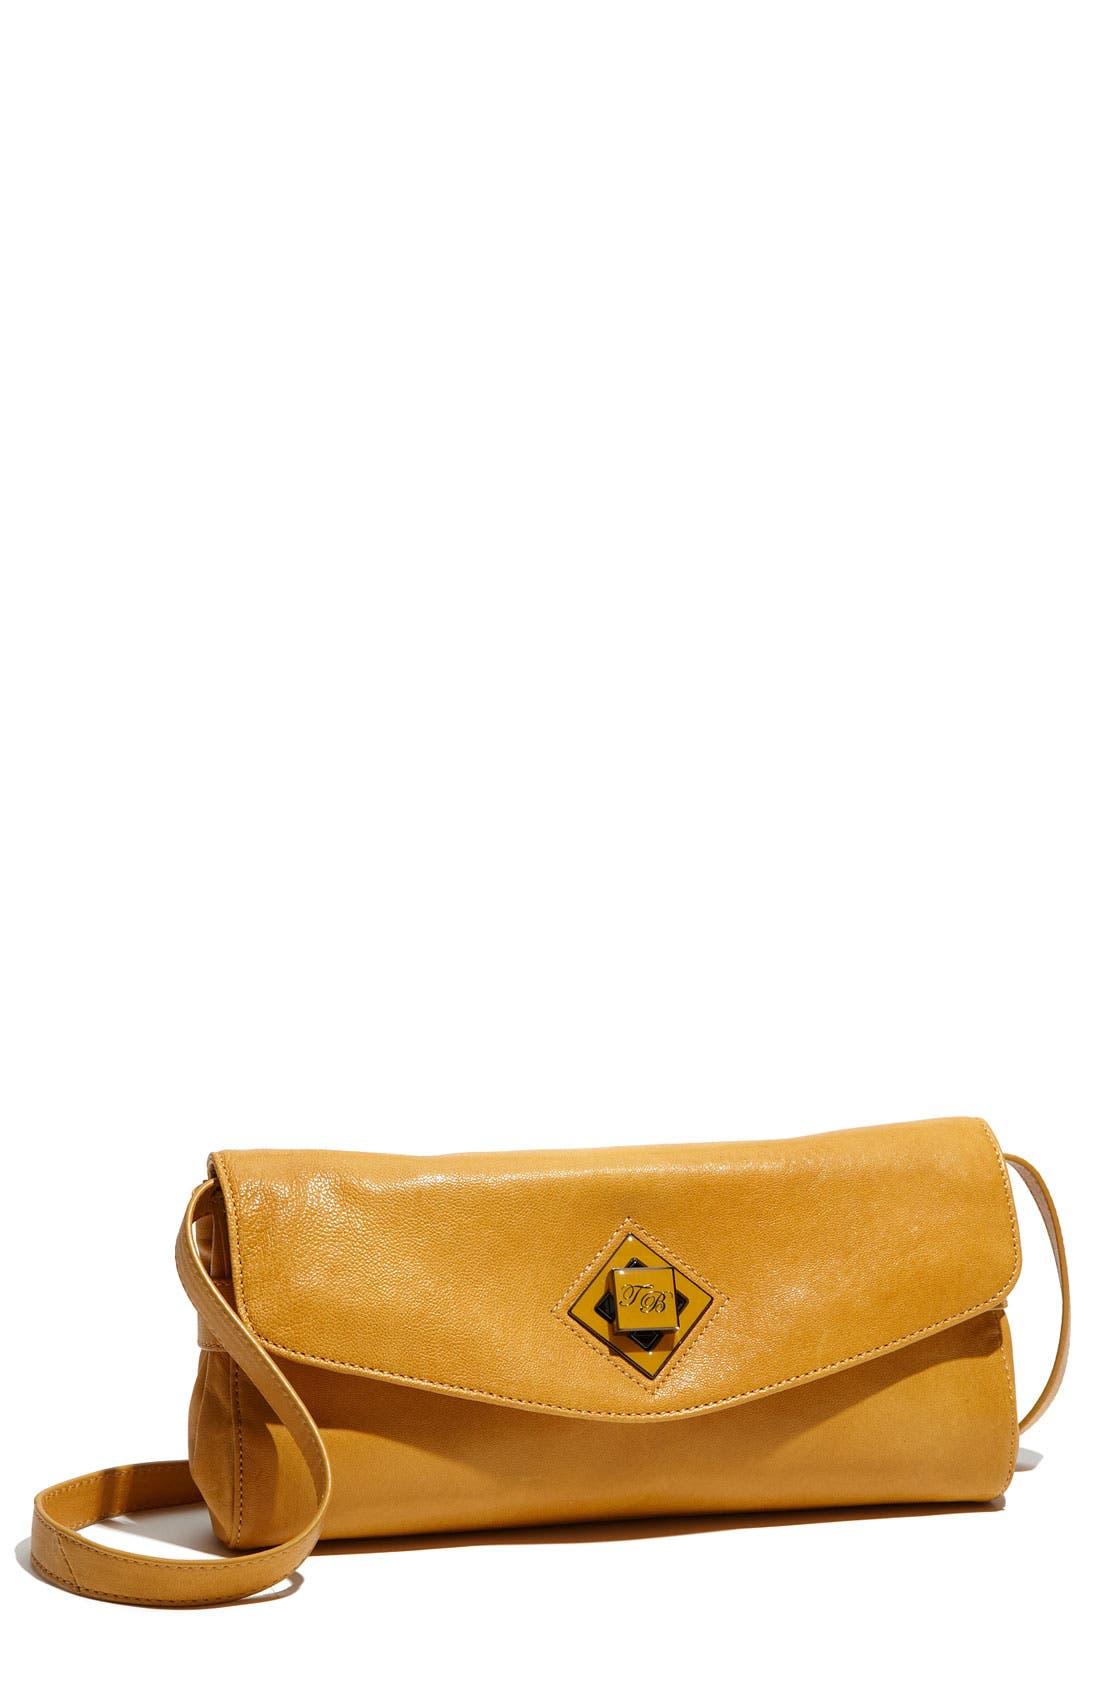 Logo Twistlock Envelope Clutch,                             Main thumbnail 1, color,                             Mustard